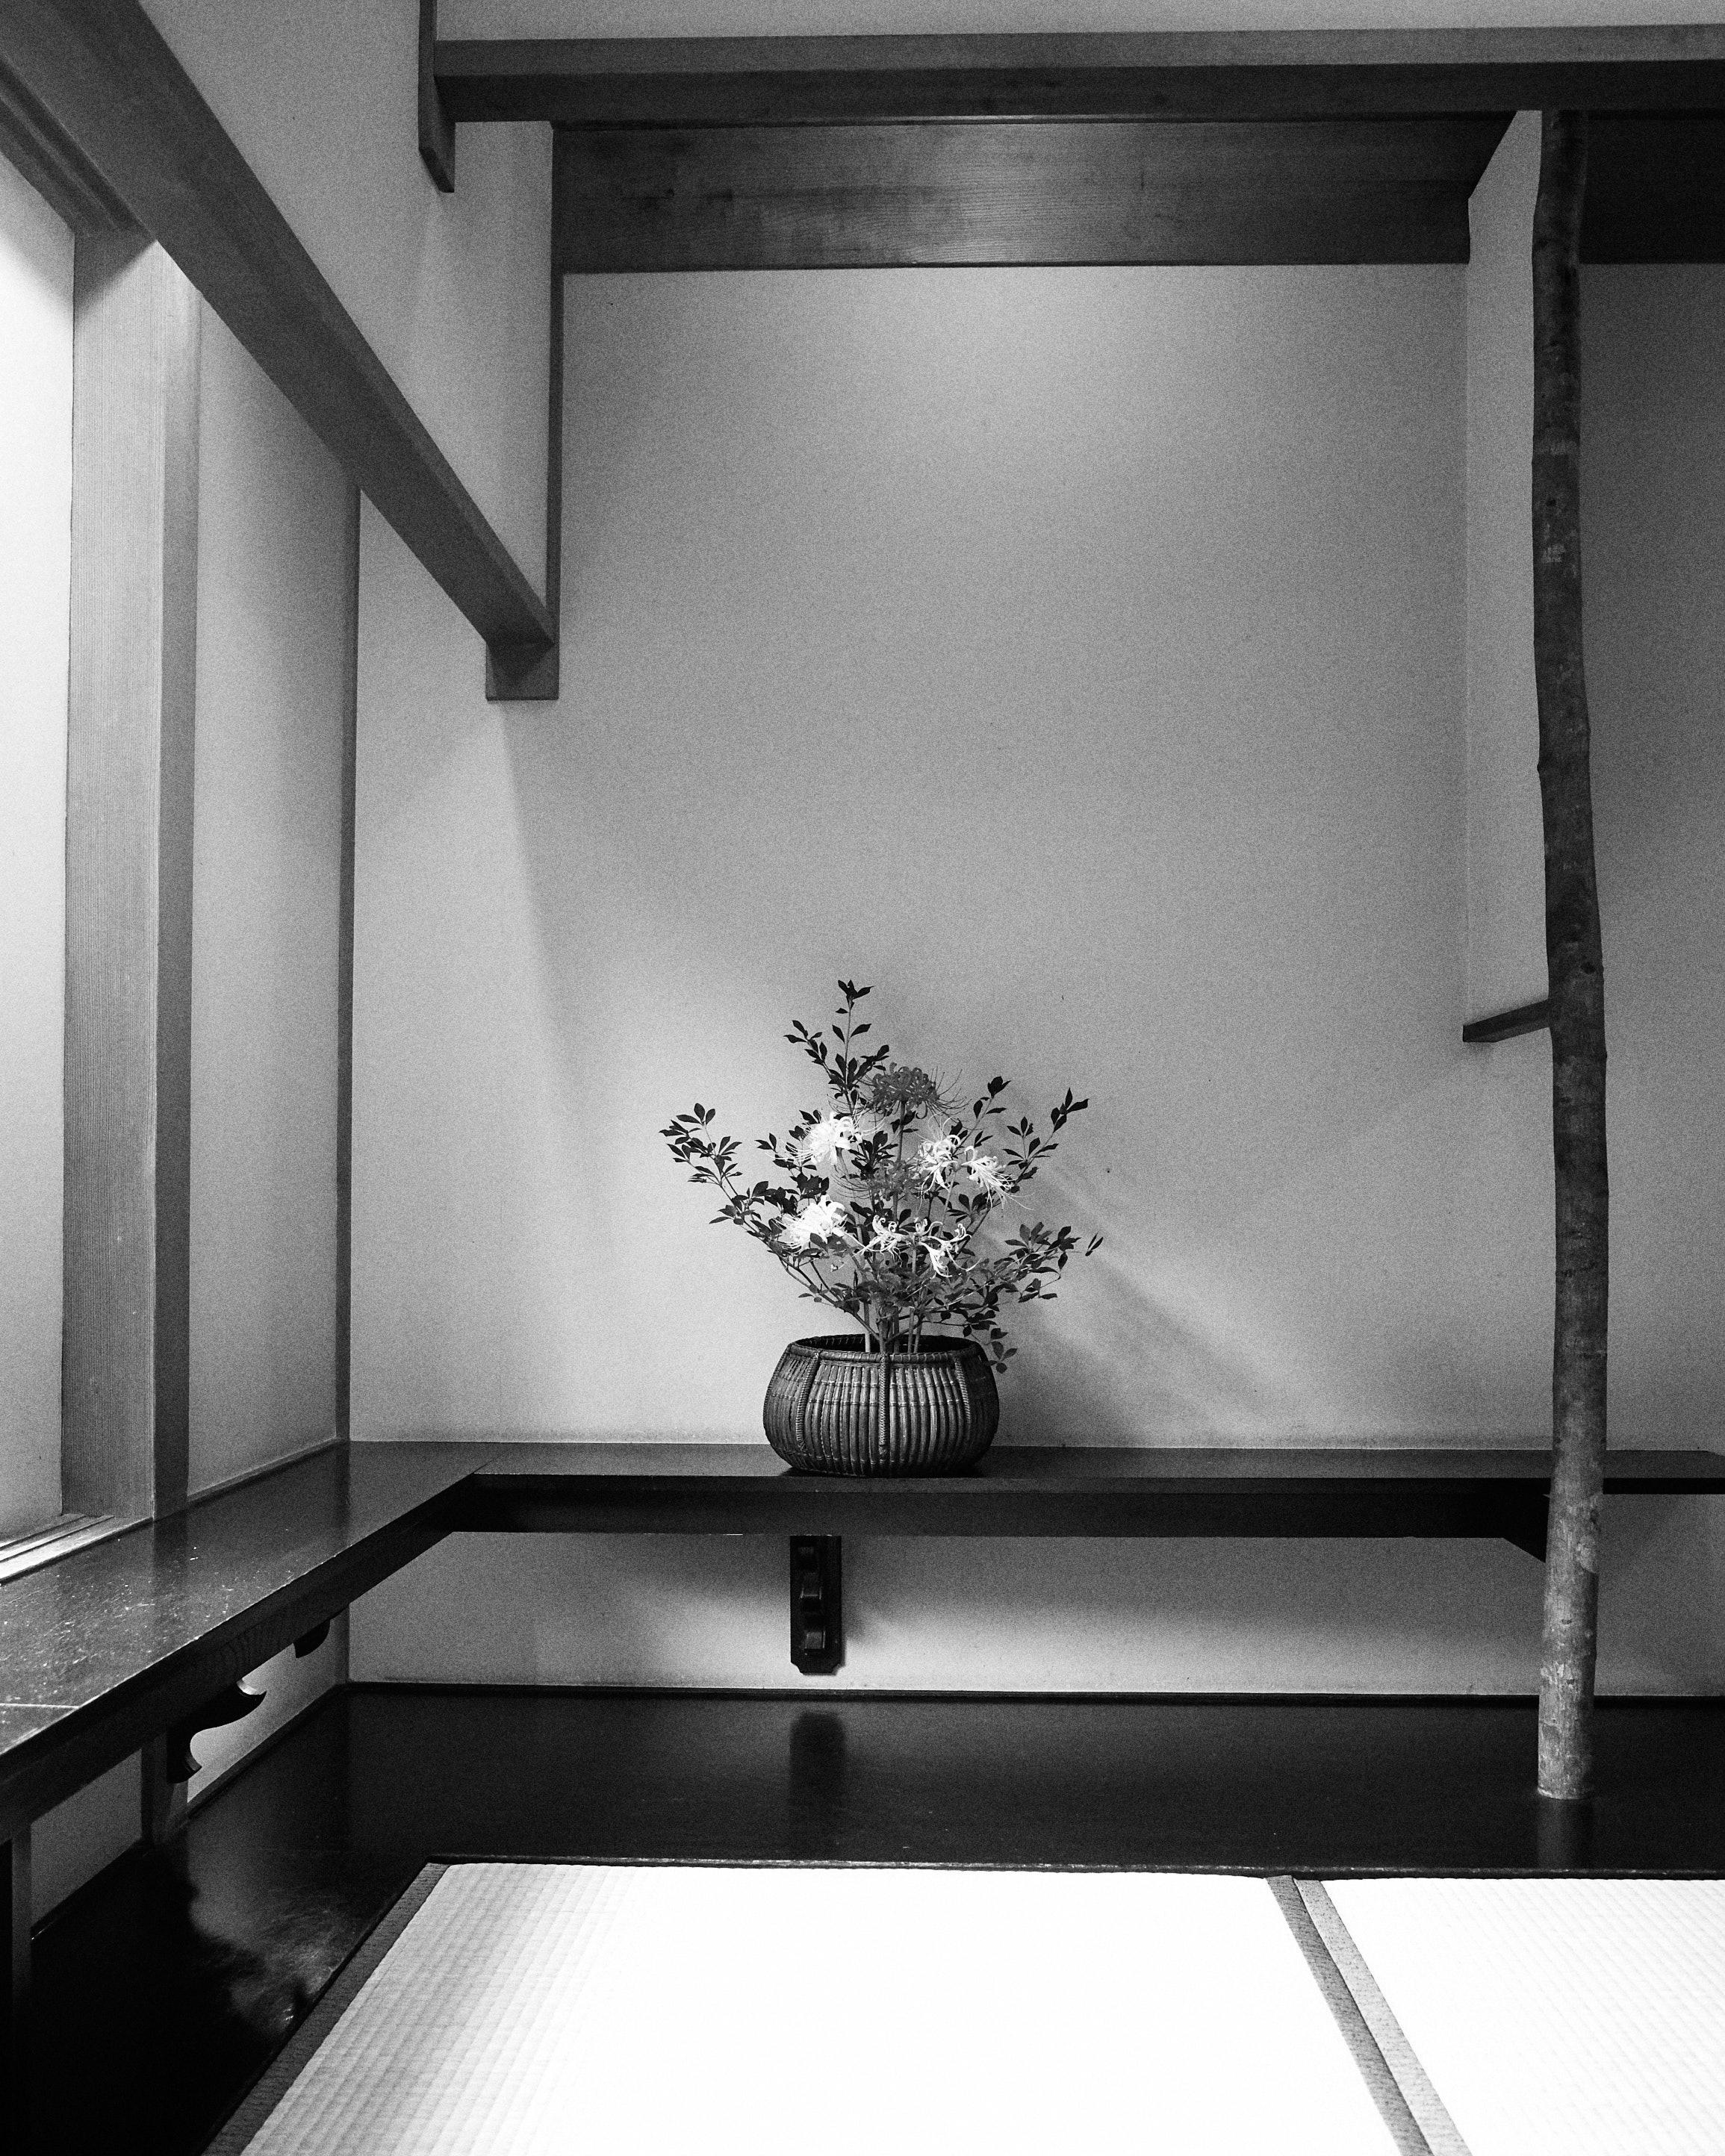 japan travel photographer kagoshima kirishima onsen ikebana